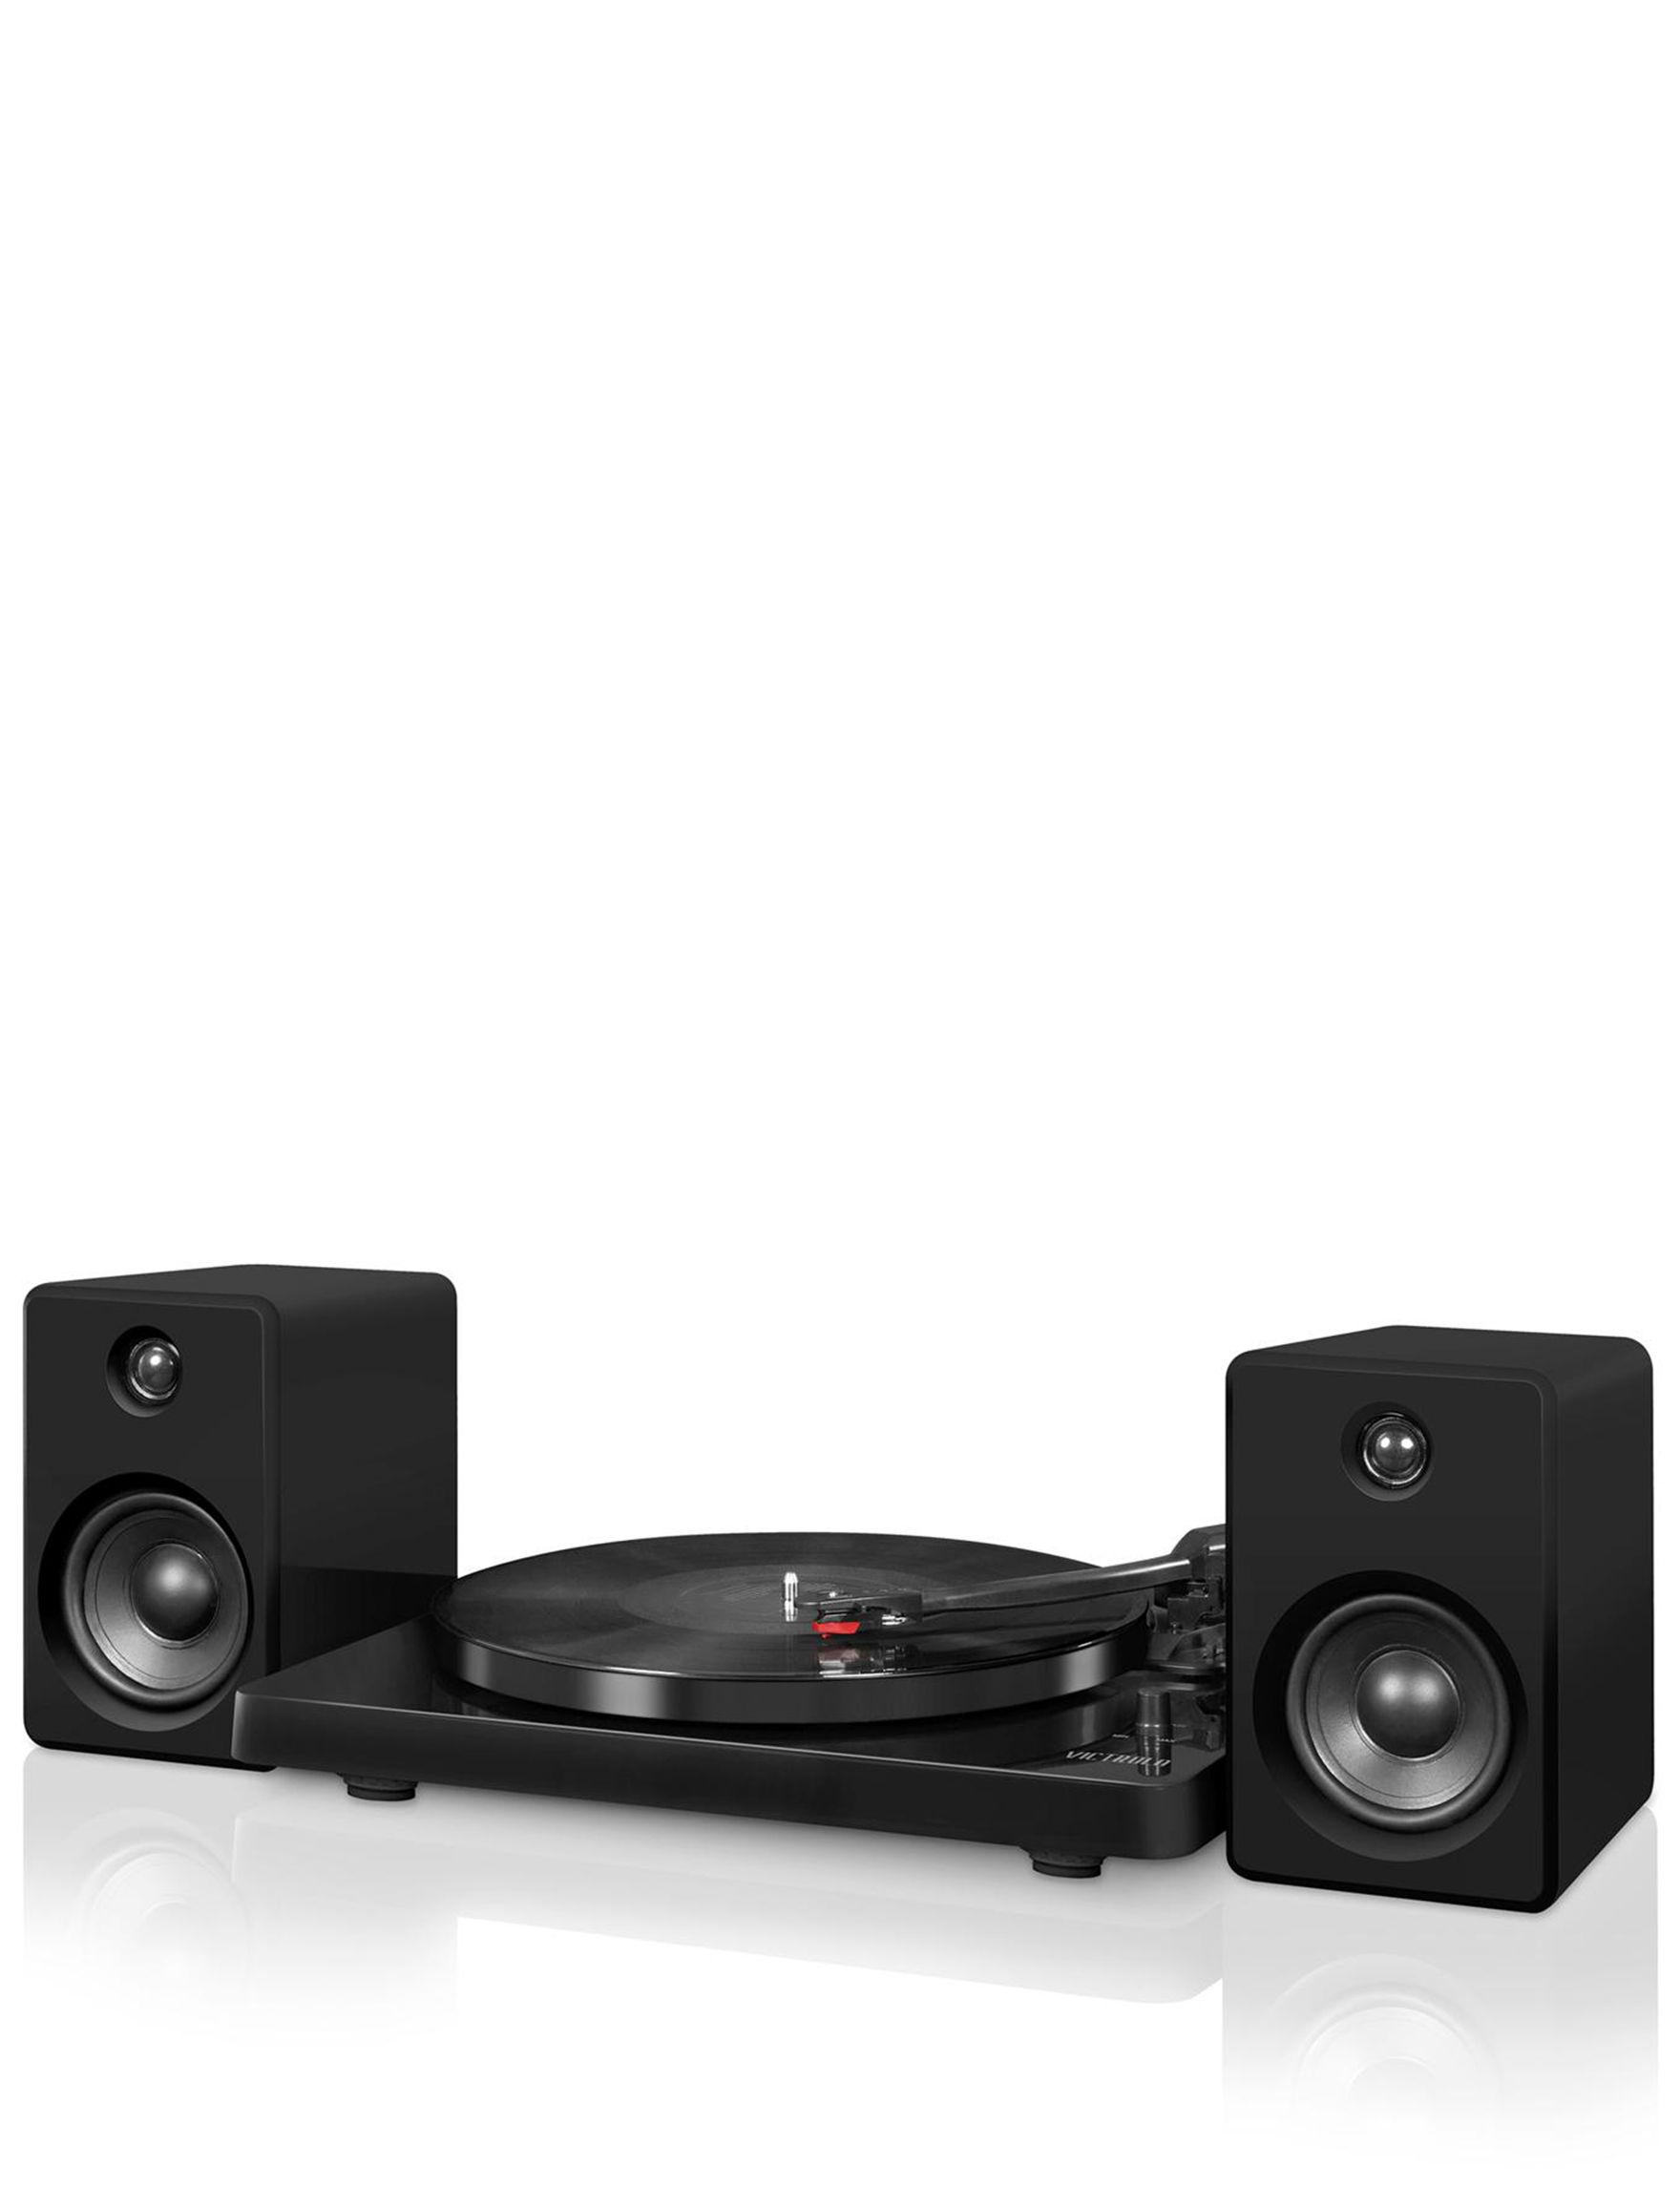 Victrola Black Speakers & Docks Home & Portable Audio